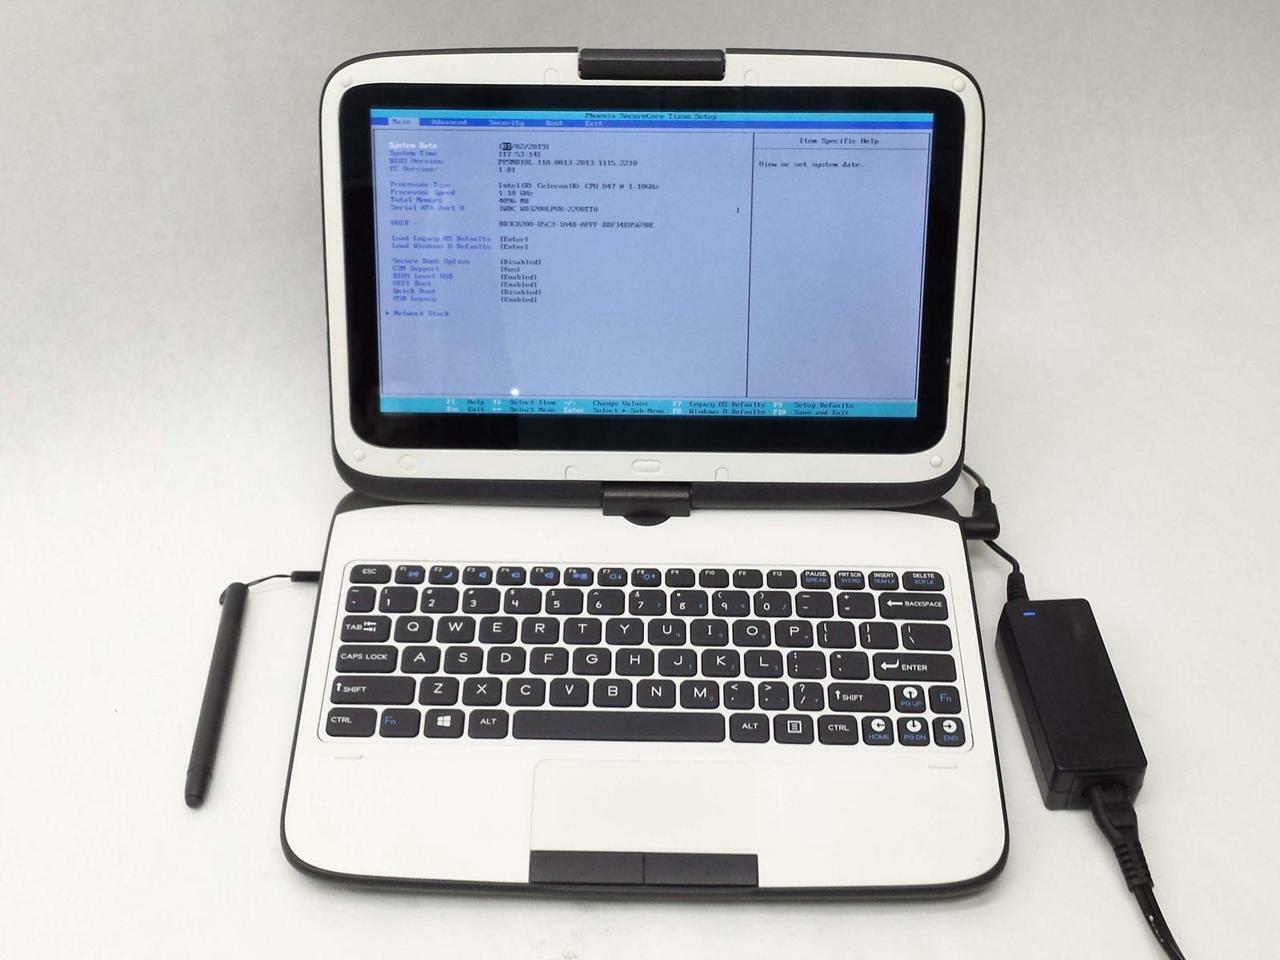 Laptop Windows - Rugged Laptop - Touchscreen Tablet Combo Windows 10